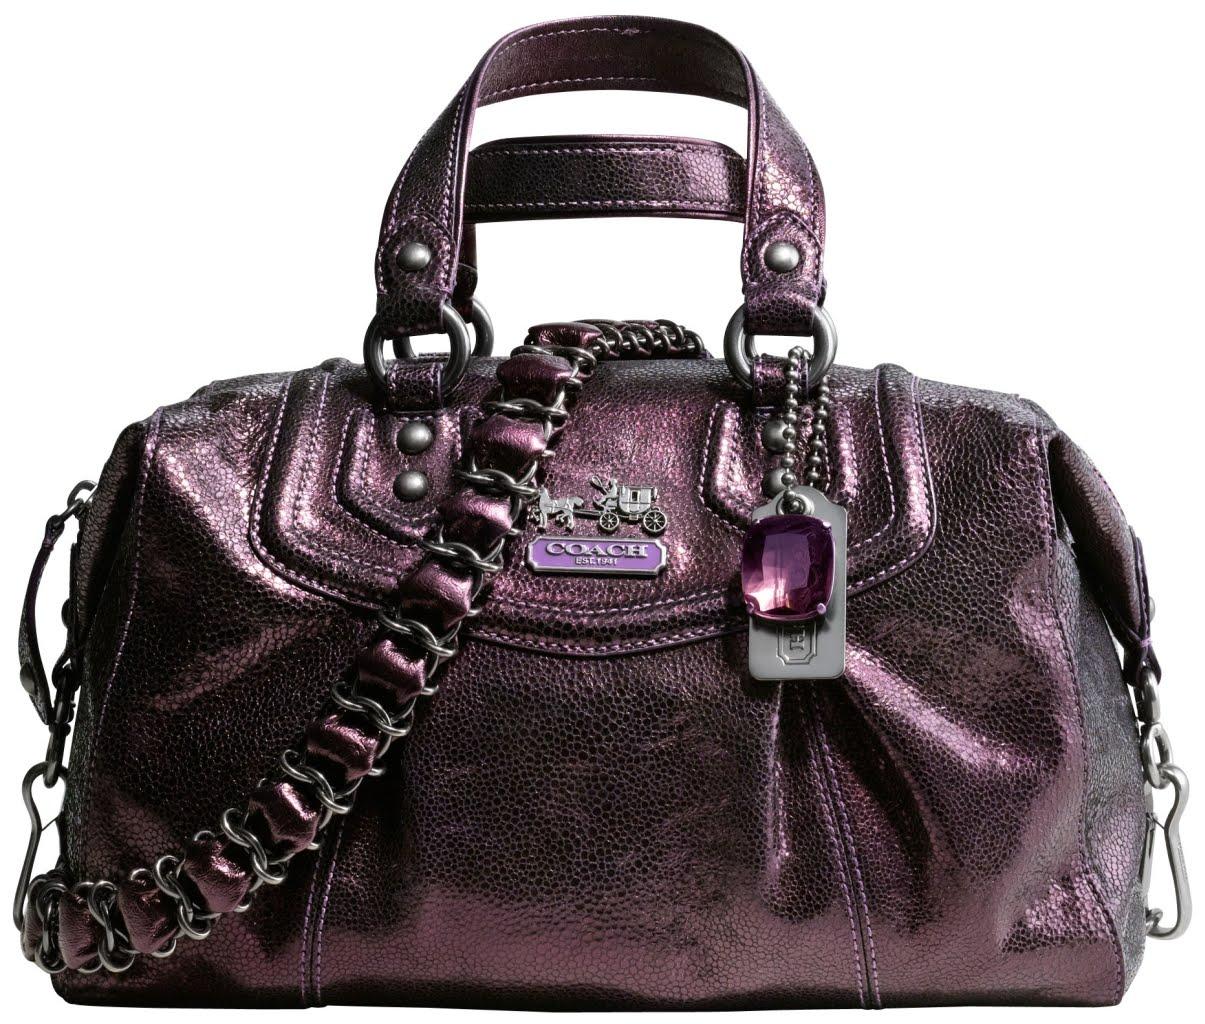 5910020bfd34 Fashionable housewife coach giveaway jpg 1205x1024 Purple leopard coach  weekender